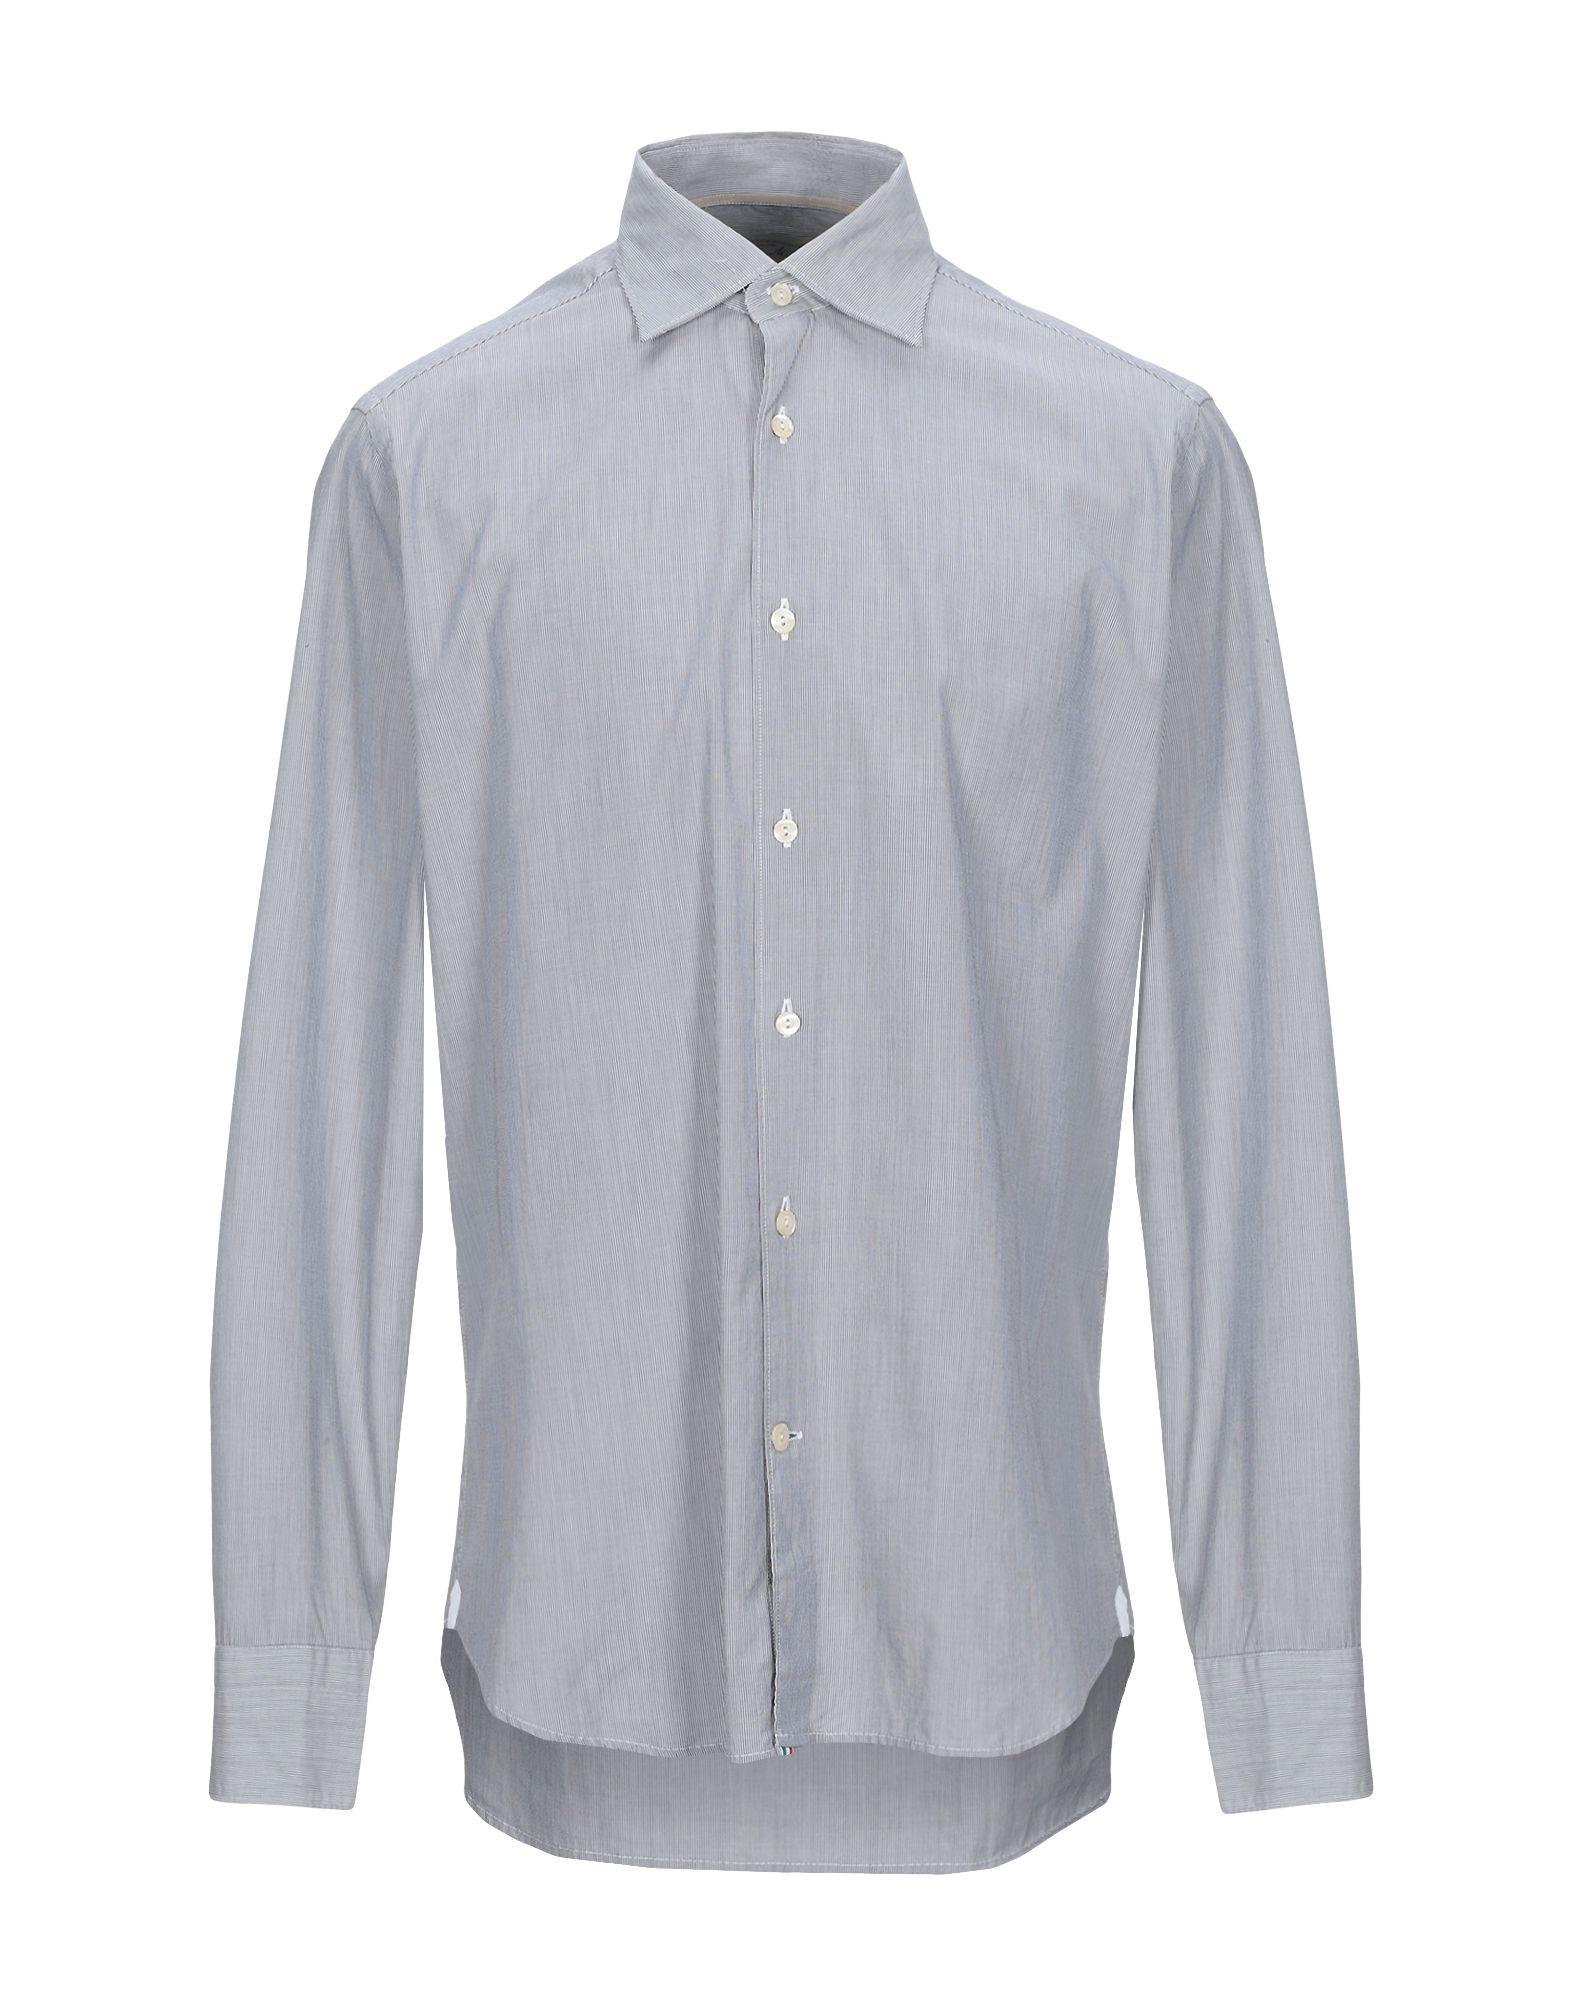 OPIFICIO MILANO M Pубашка white 5 milano pубашка